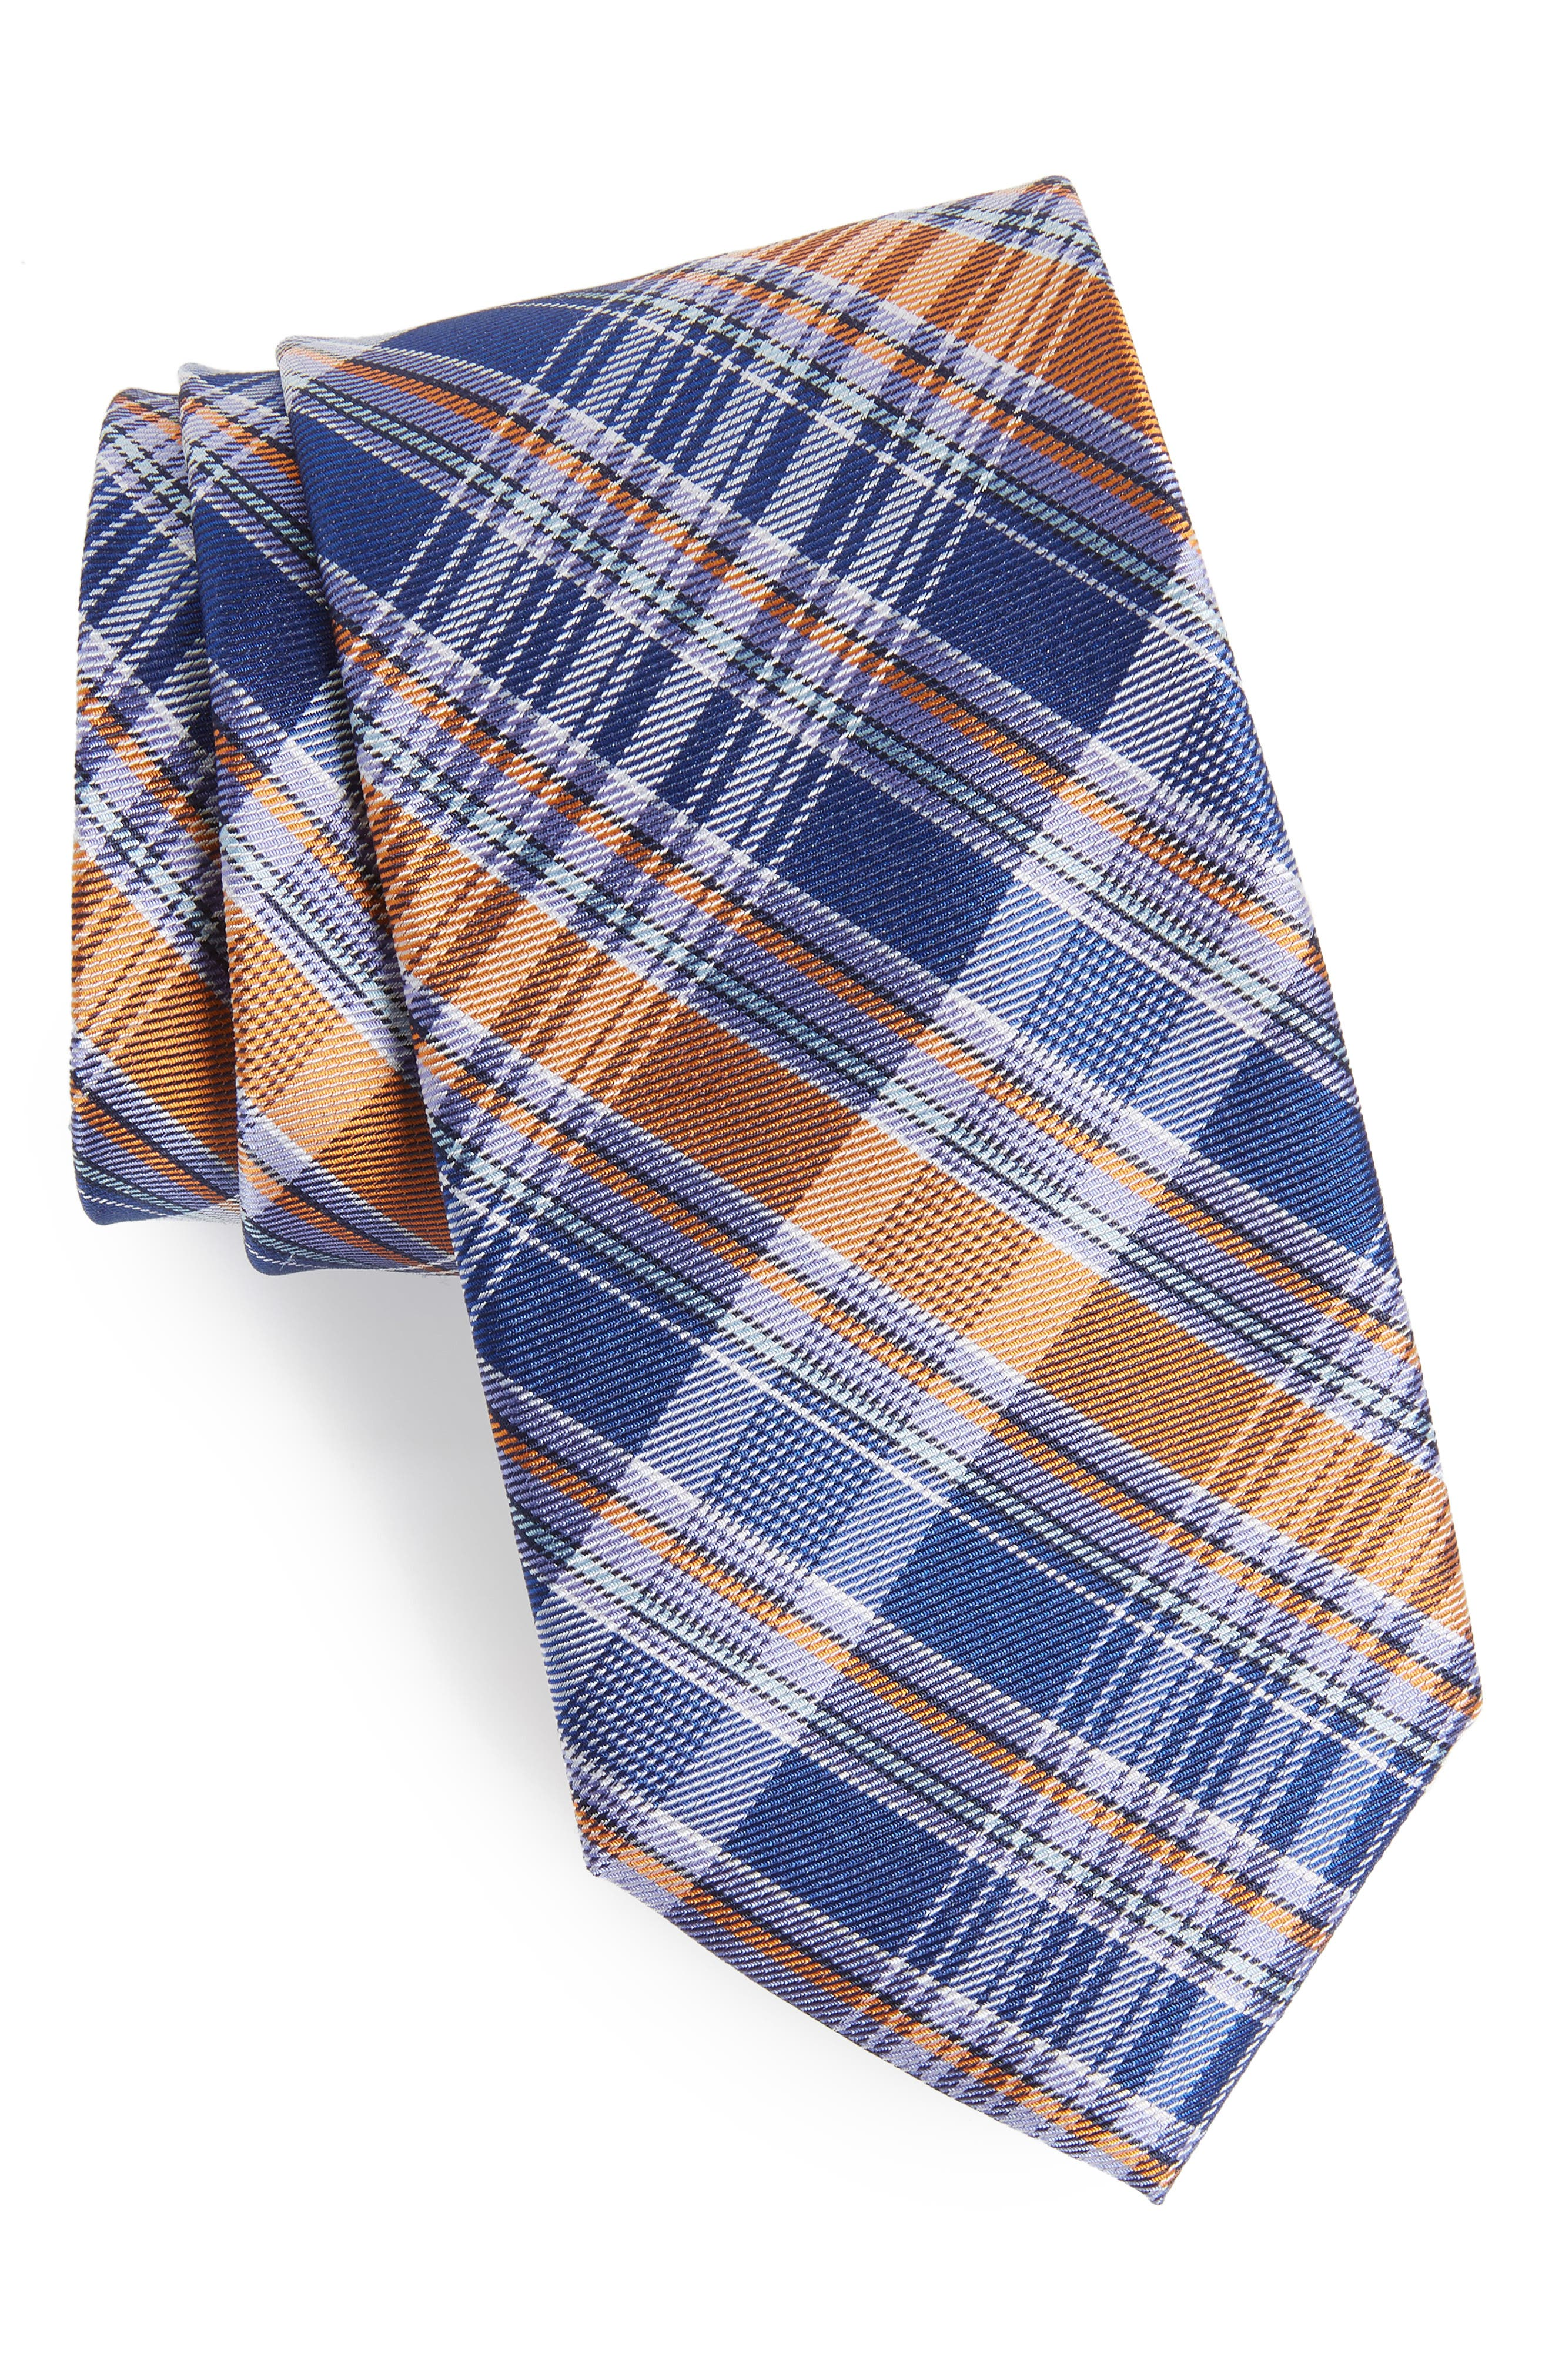 Sassafrass Plaid Silk Tie,                         Main,                         color, Bright Fashion Blue